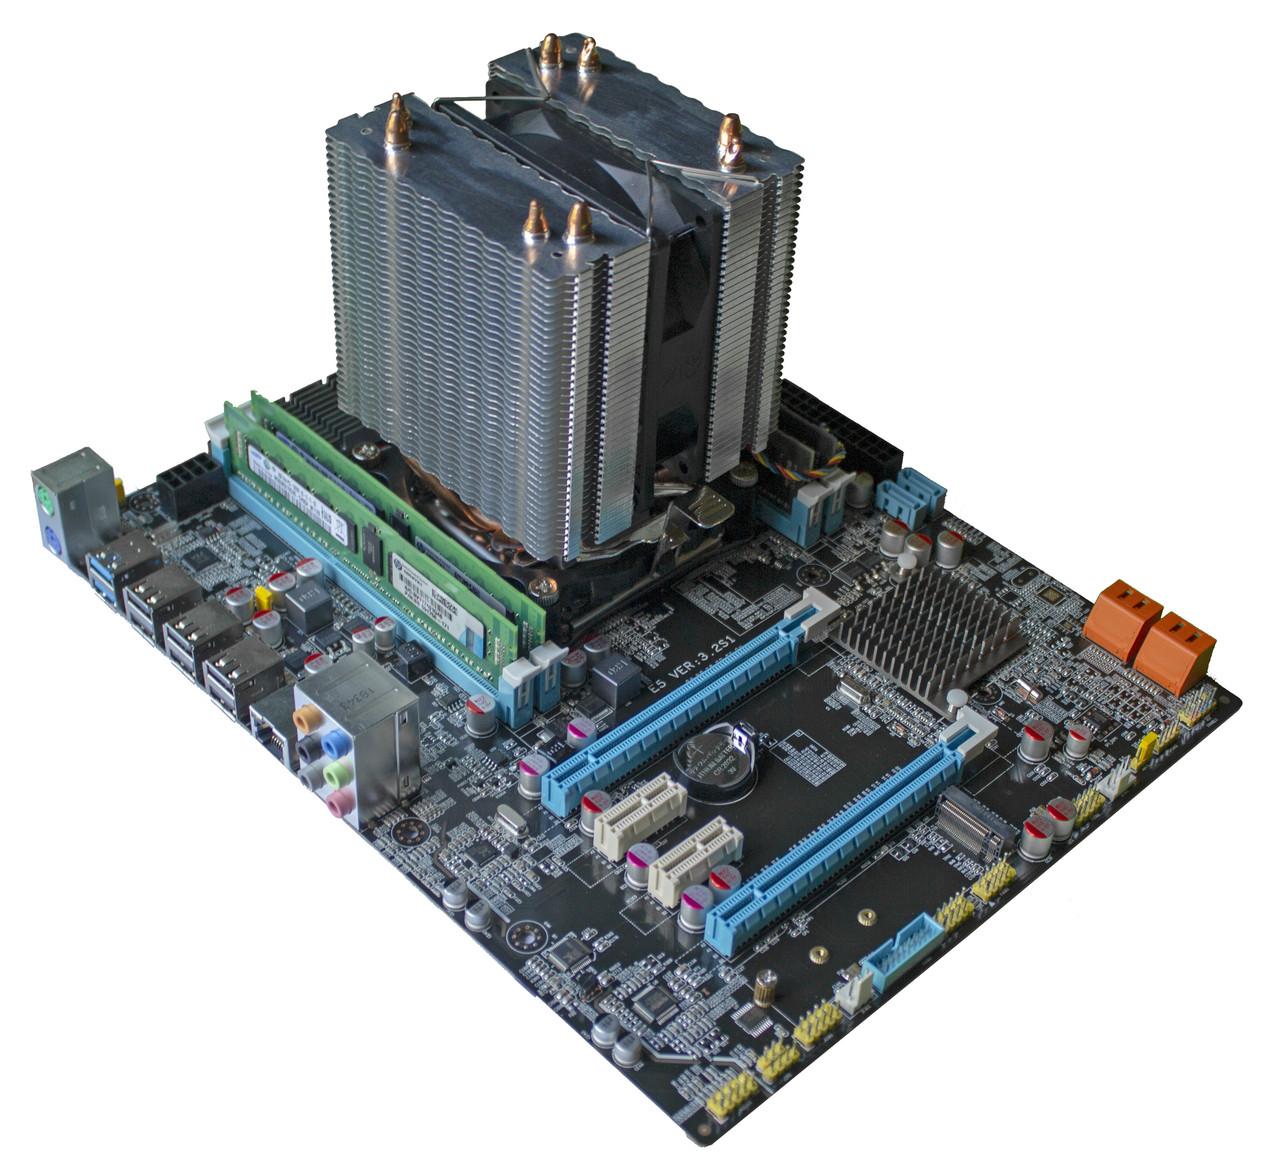 Комплект X79Z-2.4F + Xeon E5-1620v2 + 8 GB RAM + Кулер, LGA 2011